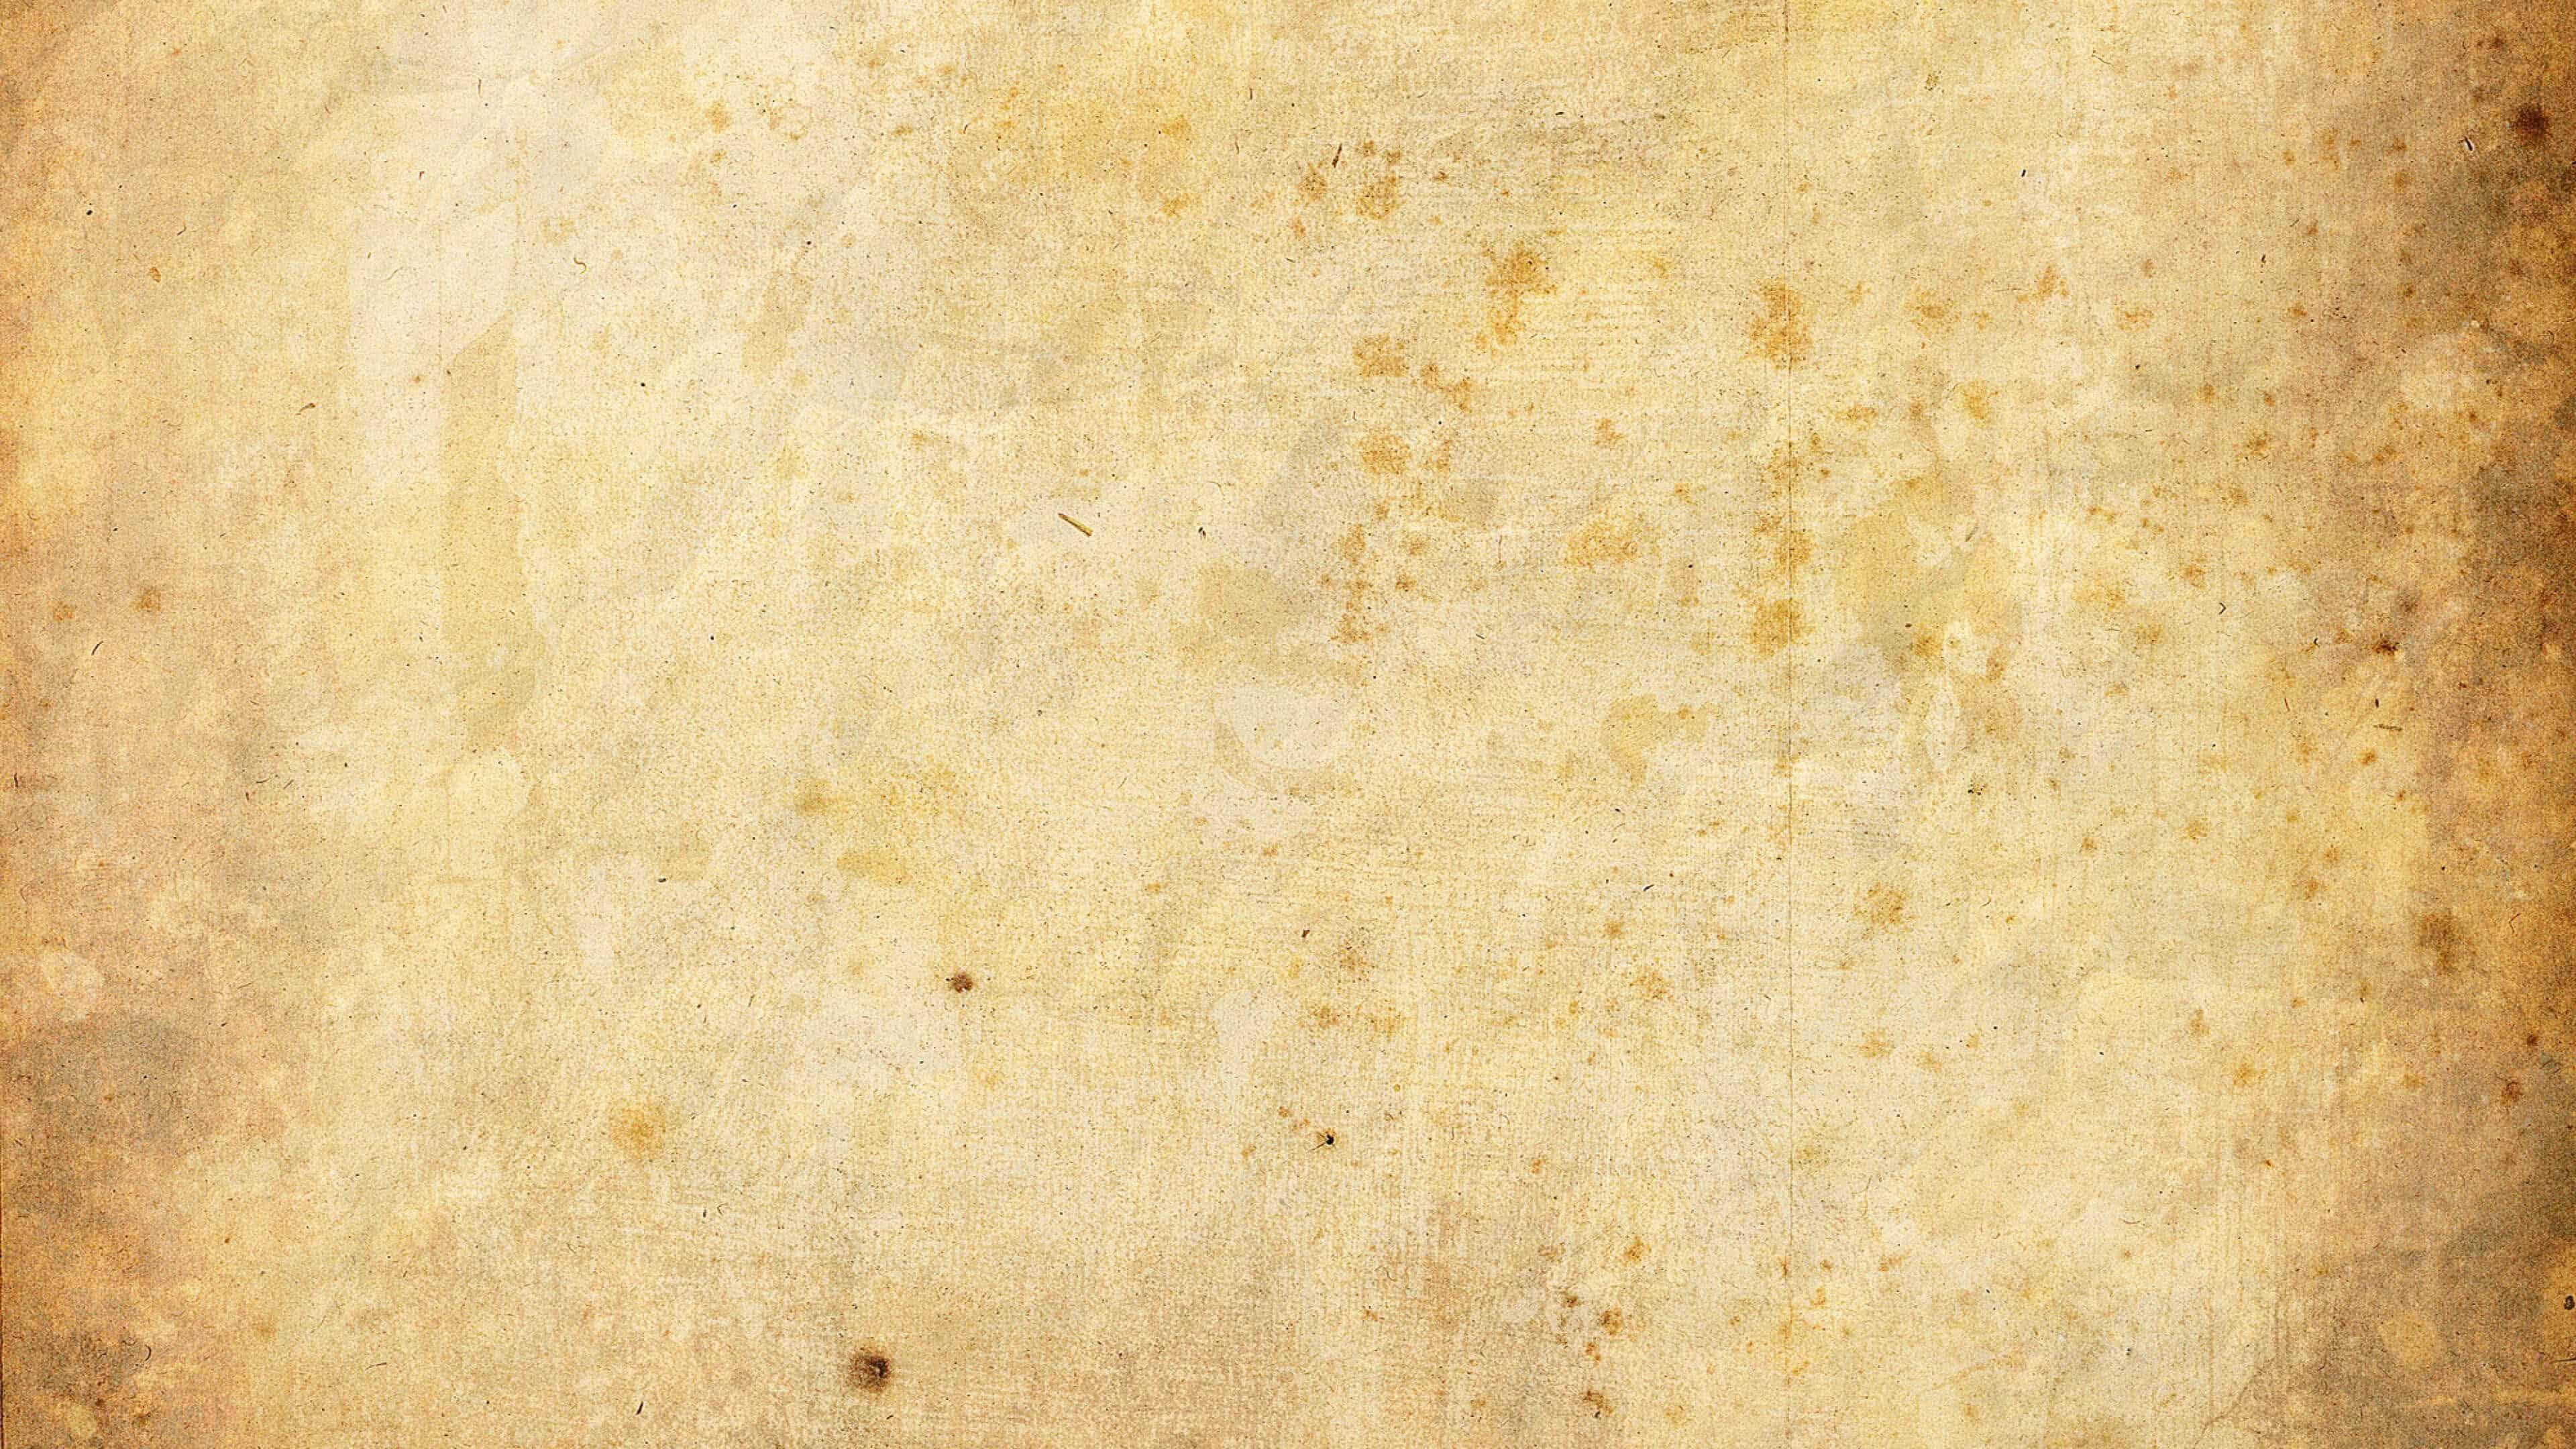 vintage paper texture uhd 4k wallpaper